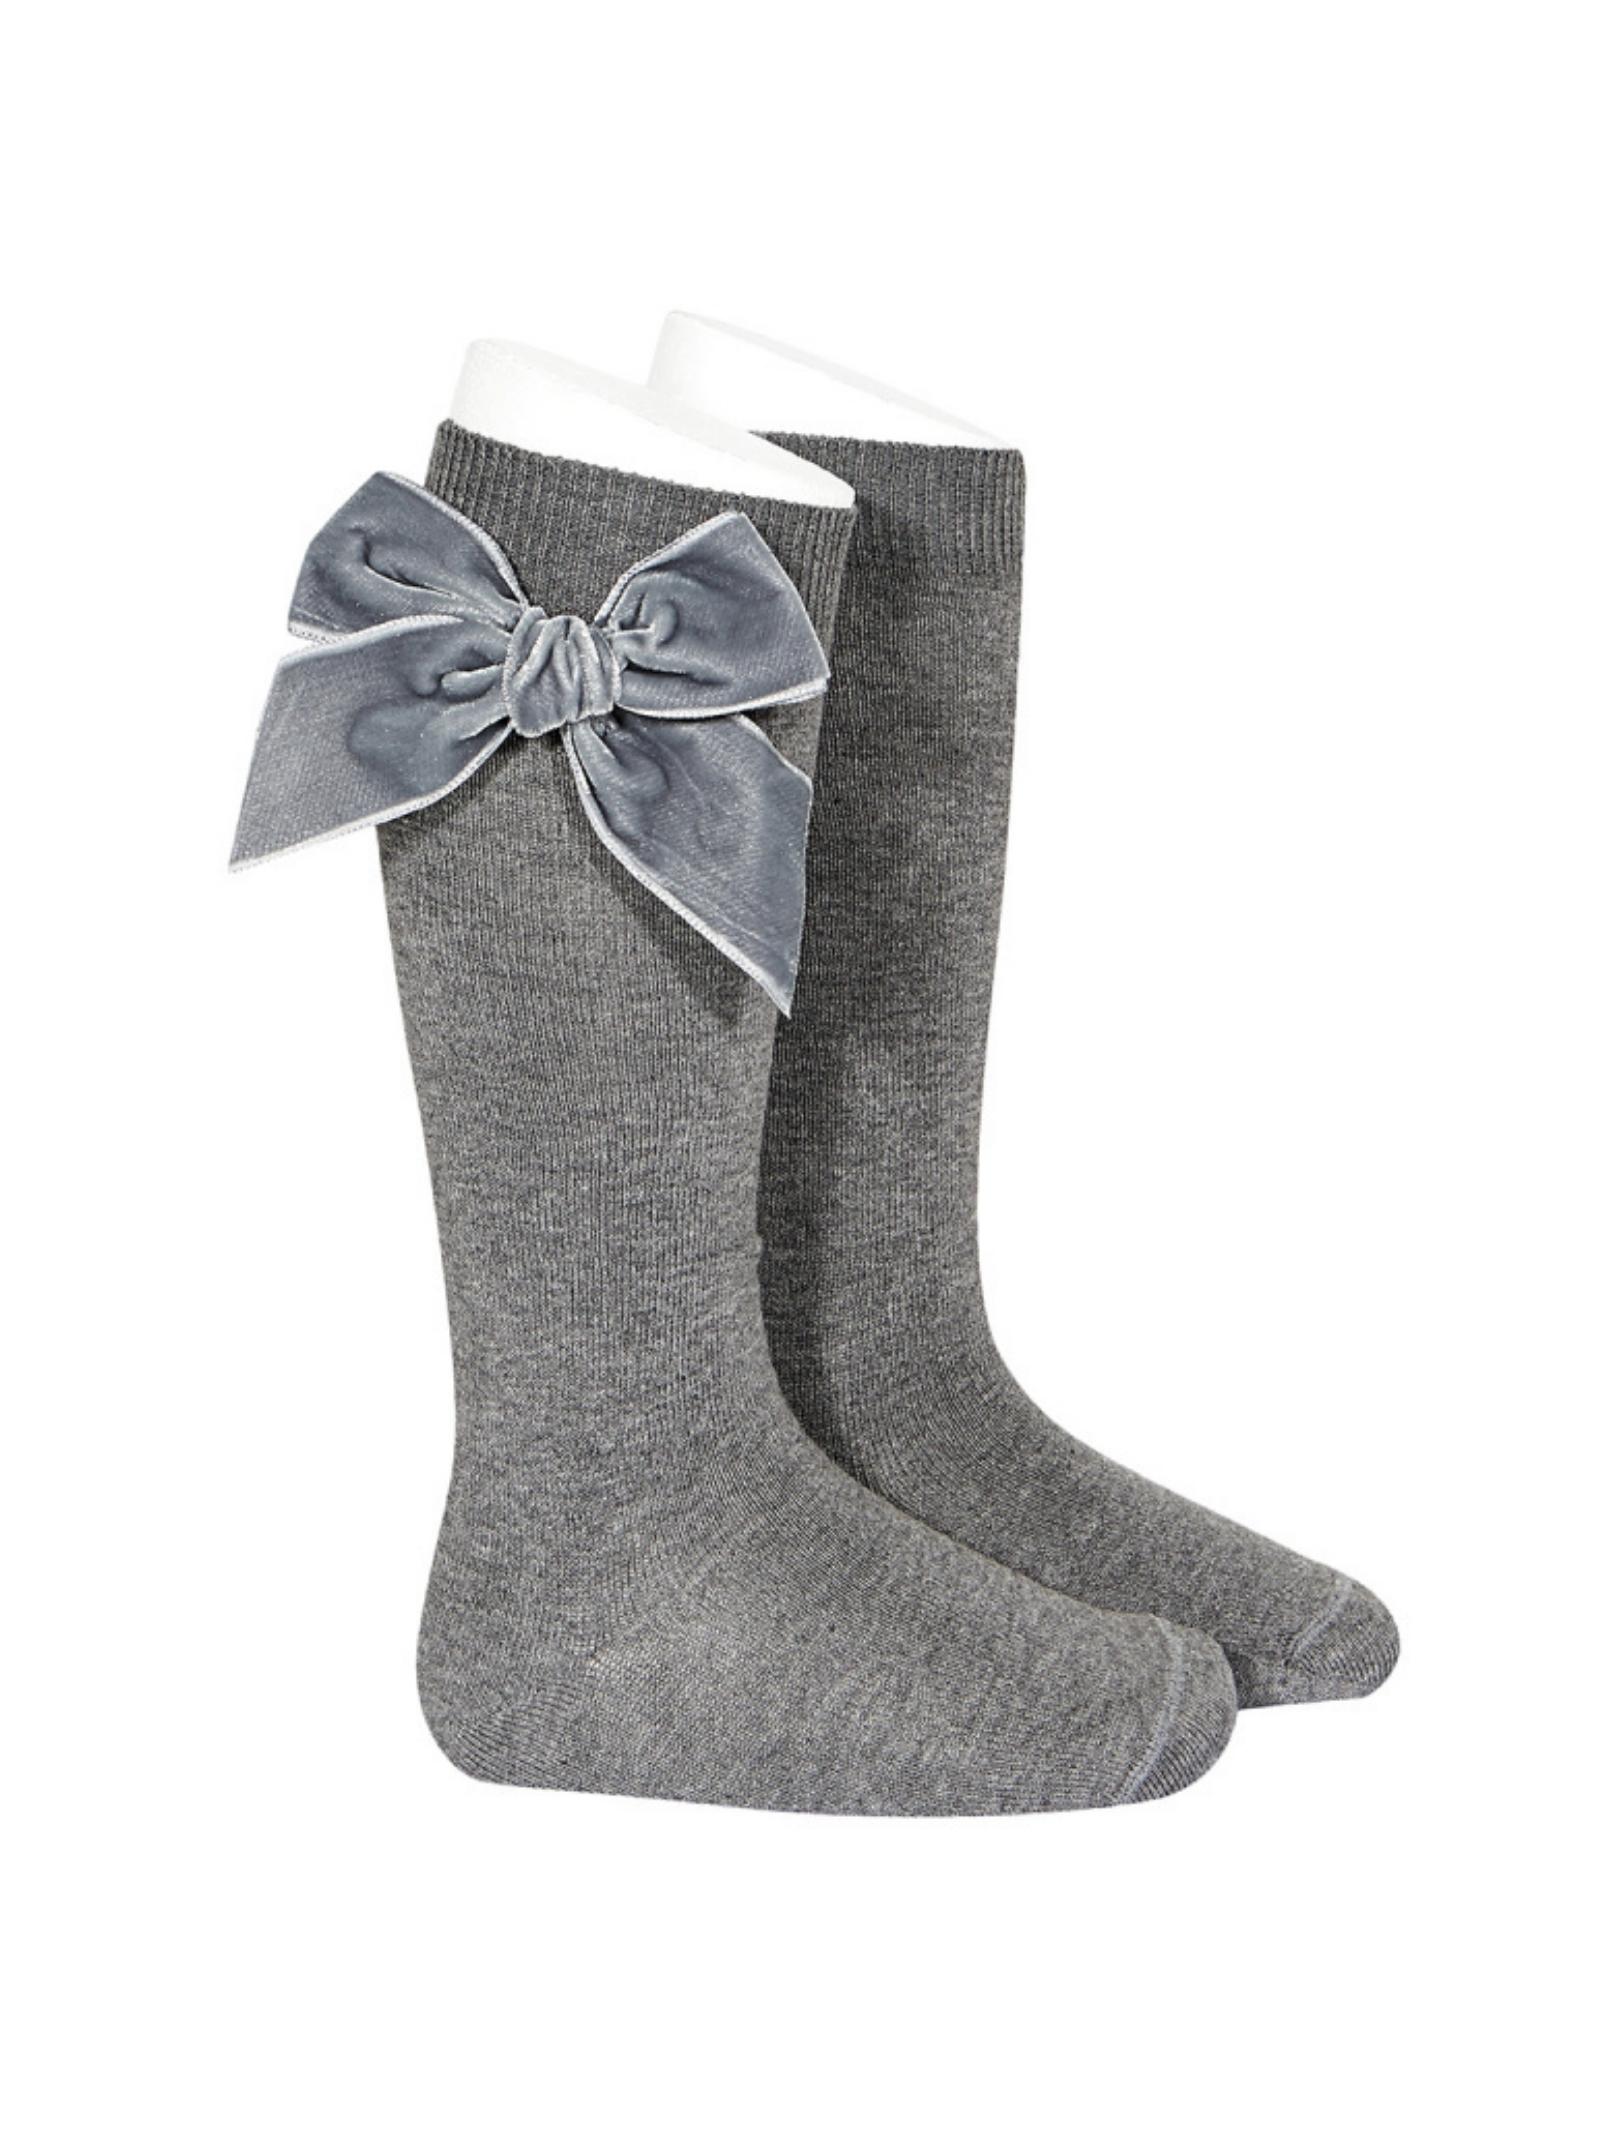 Parisian Bow Socks for Girls CONDOR | Socks | 24892230